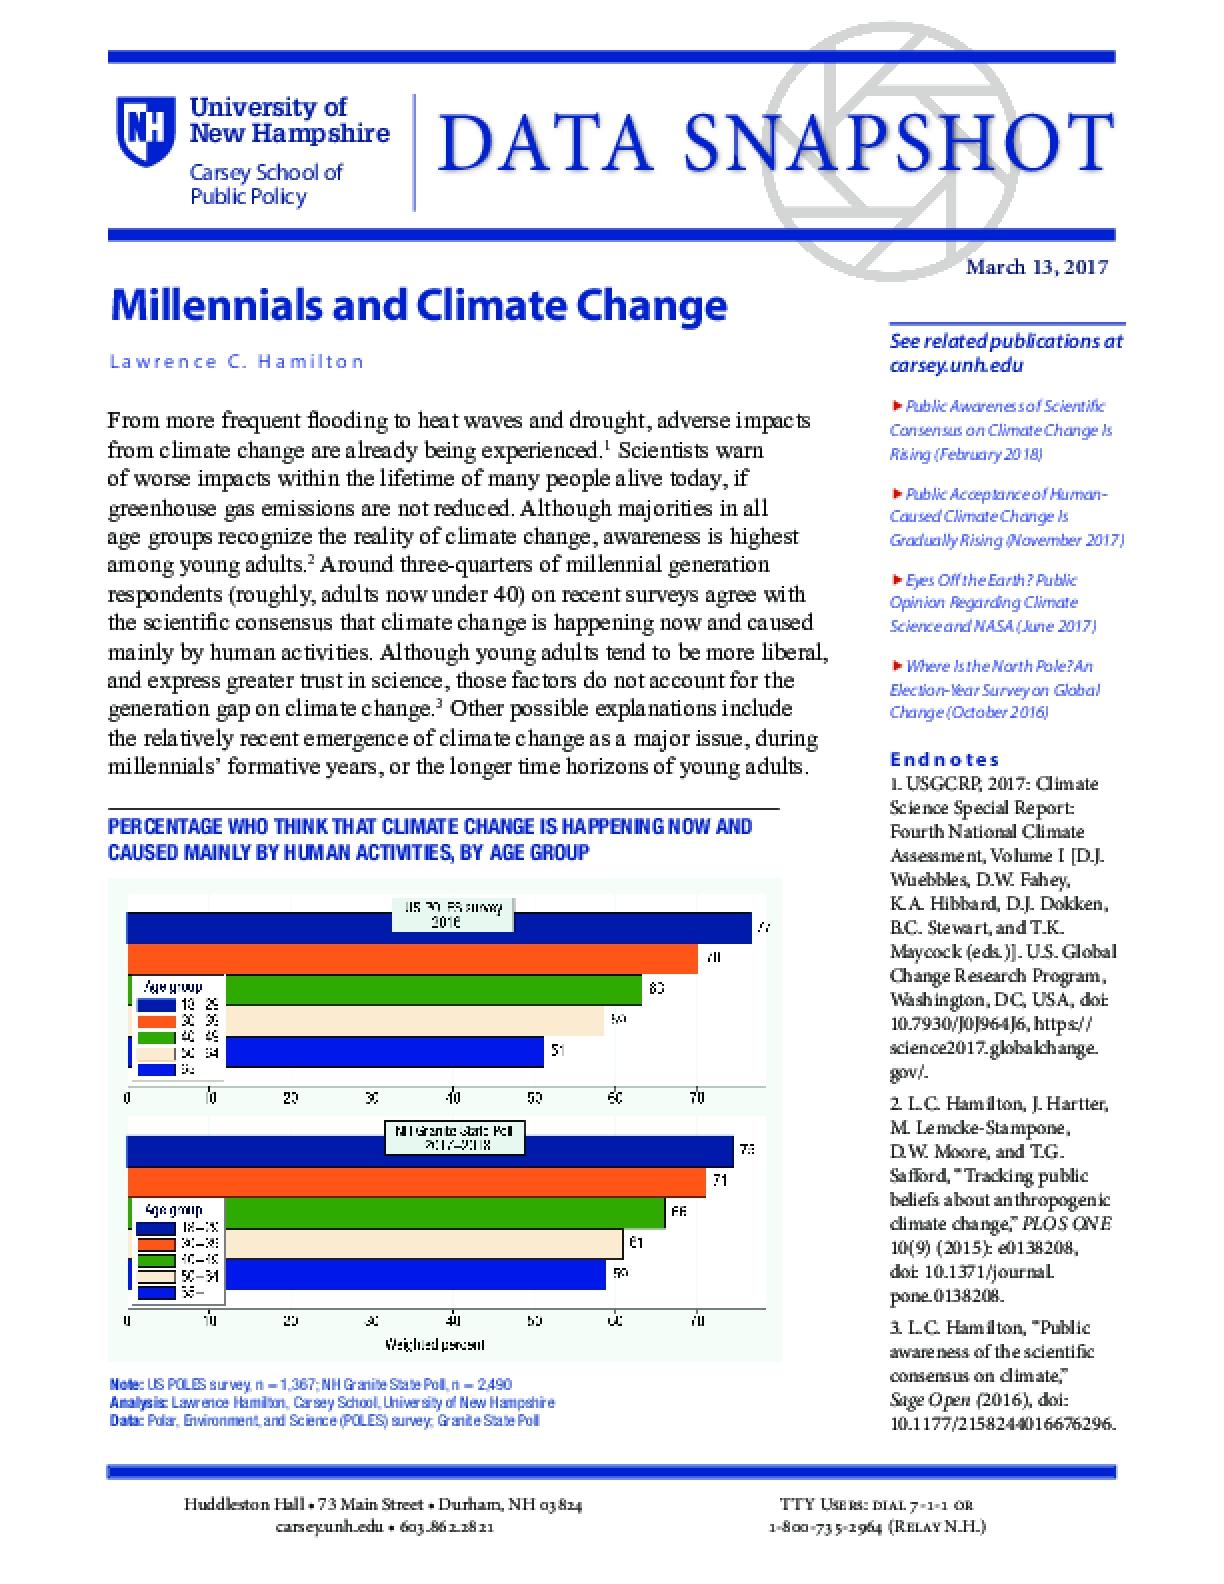 Data Snapshot: Millennials and Climate Change